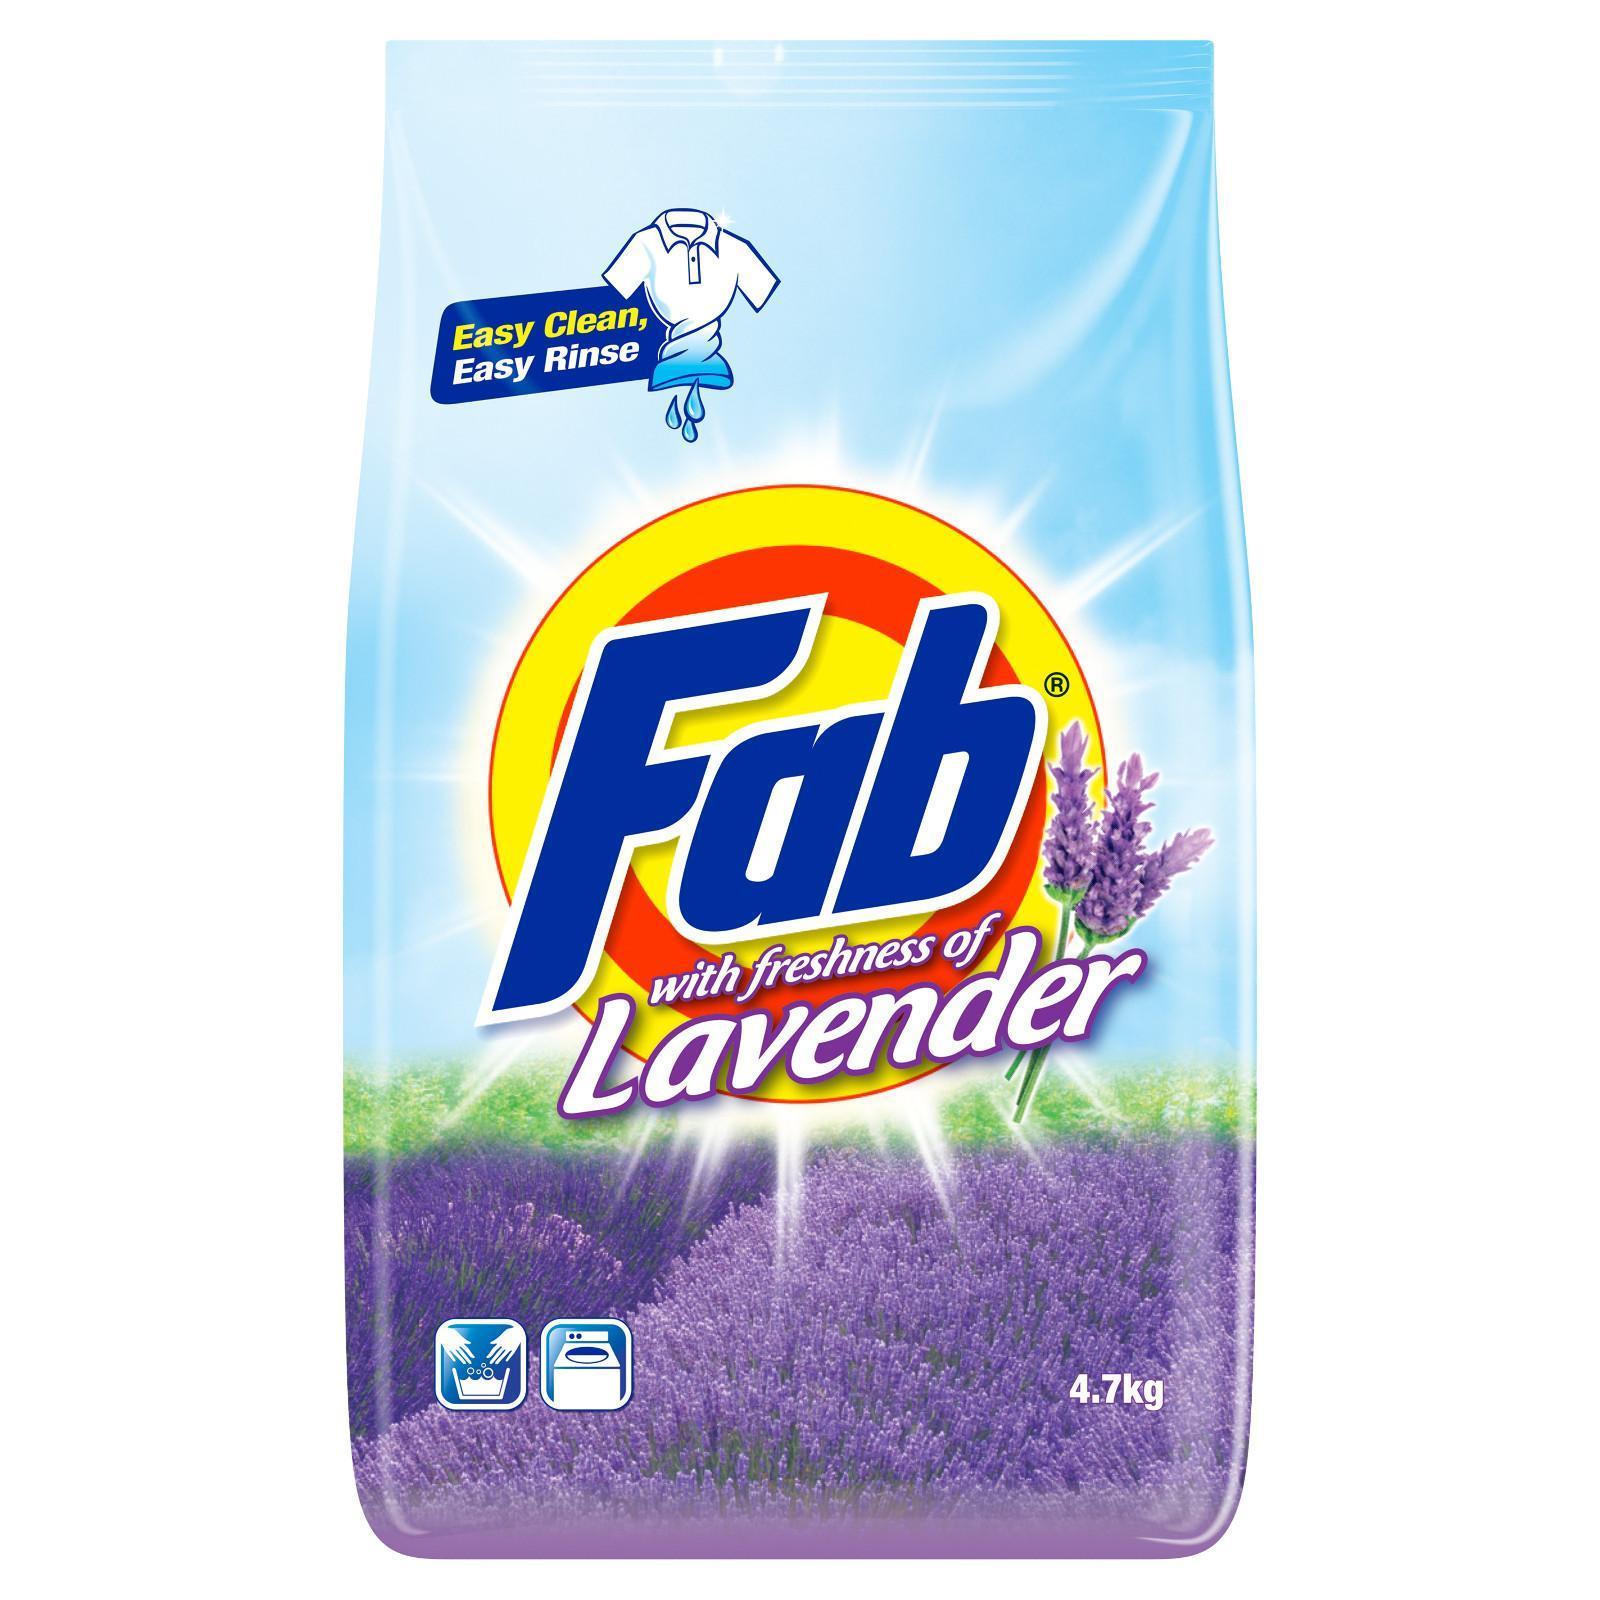 FAB Laundry Powder - Freshness of Lavender 4.7kg